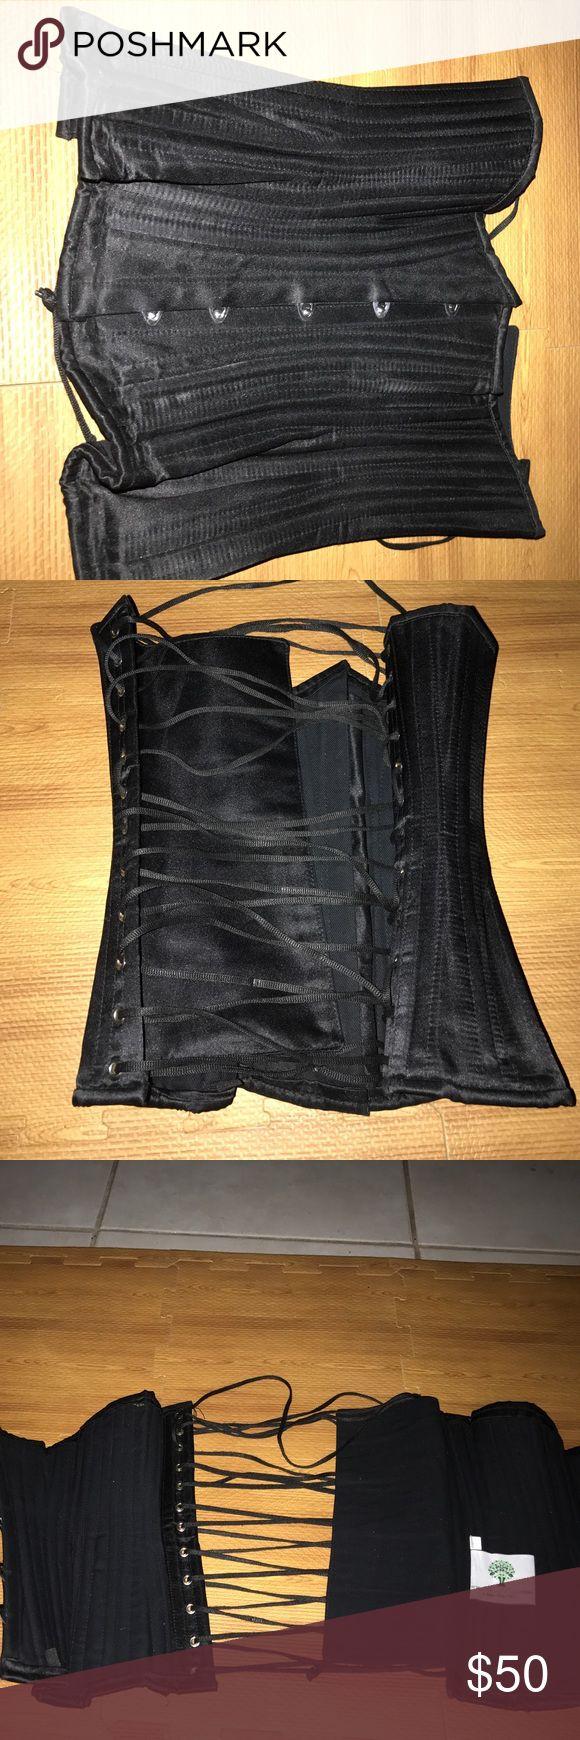 Clip zip waist trainer perfect floral design waist training cinchers - Corset True Steel Rods Corset For Waist Trainingsteel